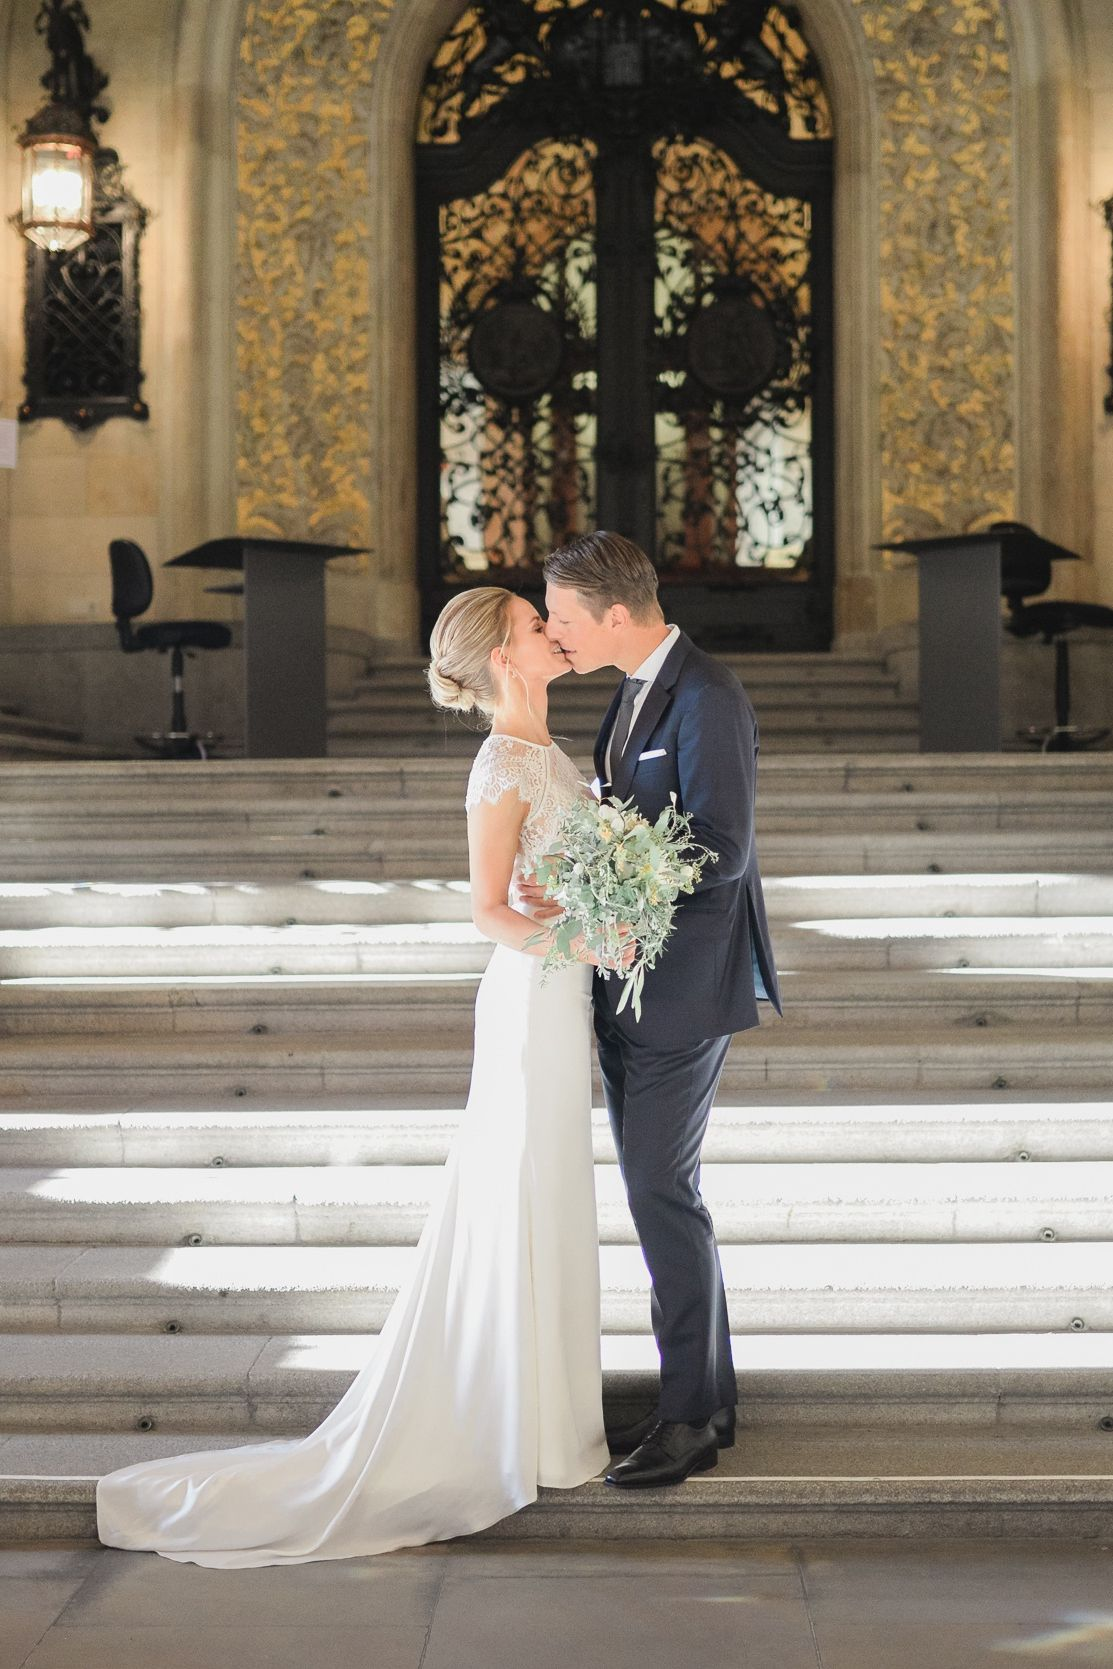 Best Of Weddings Anma Koy Photography Fine Art Weddings Hochzeit Hochzeitsfotografie Hochzeitsfotograf